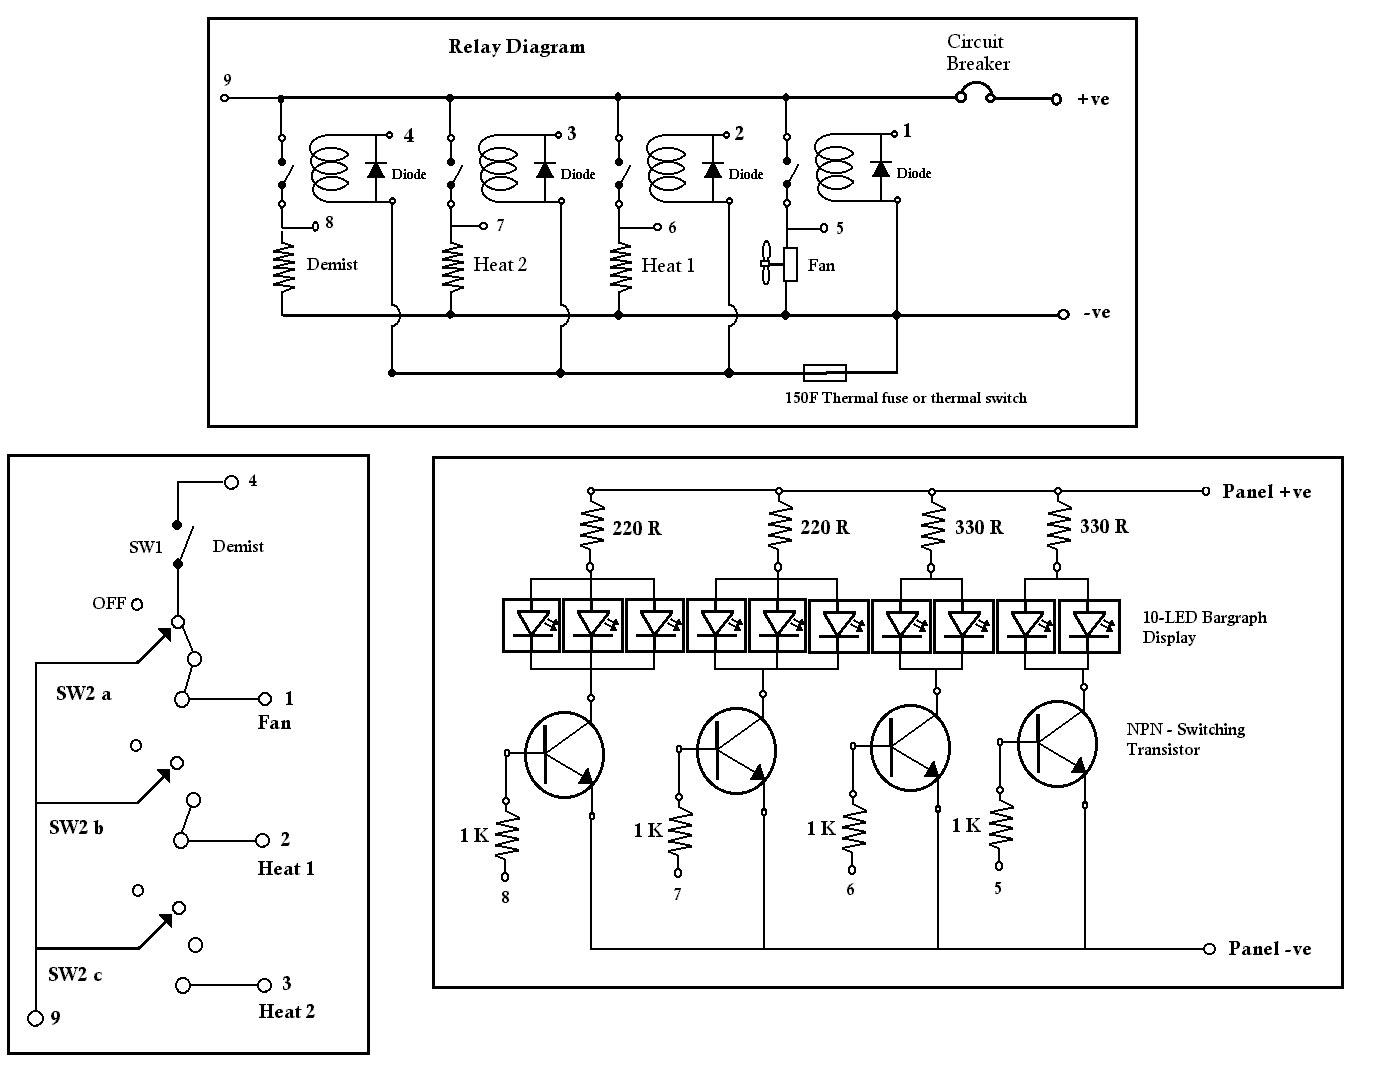 Lakewood Electric Heater Wiring Diagram Wire Data Schema Hot Water 792 Jr 46 Richmond